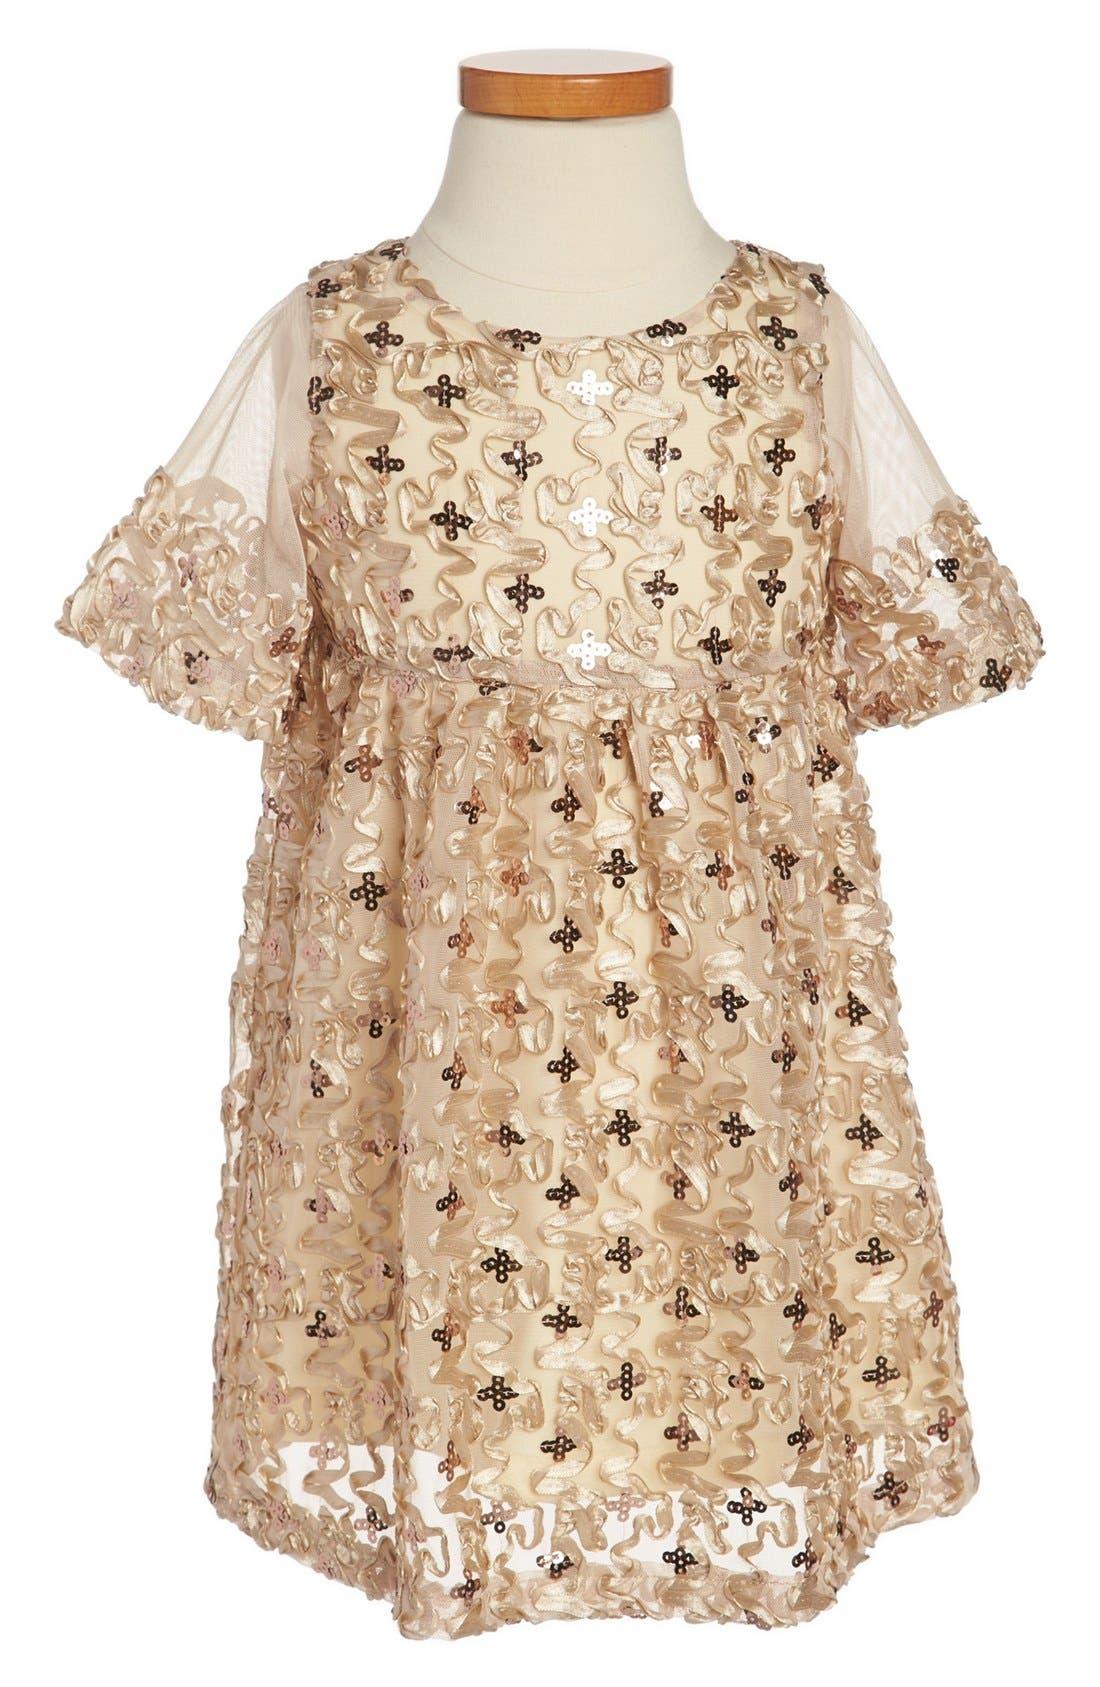 Alternate Image 1 Selected - Laundry by Shelli Segal Sequin Dress (Toddler Girls)